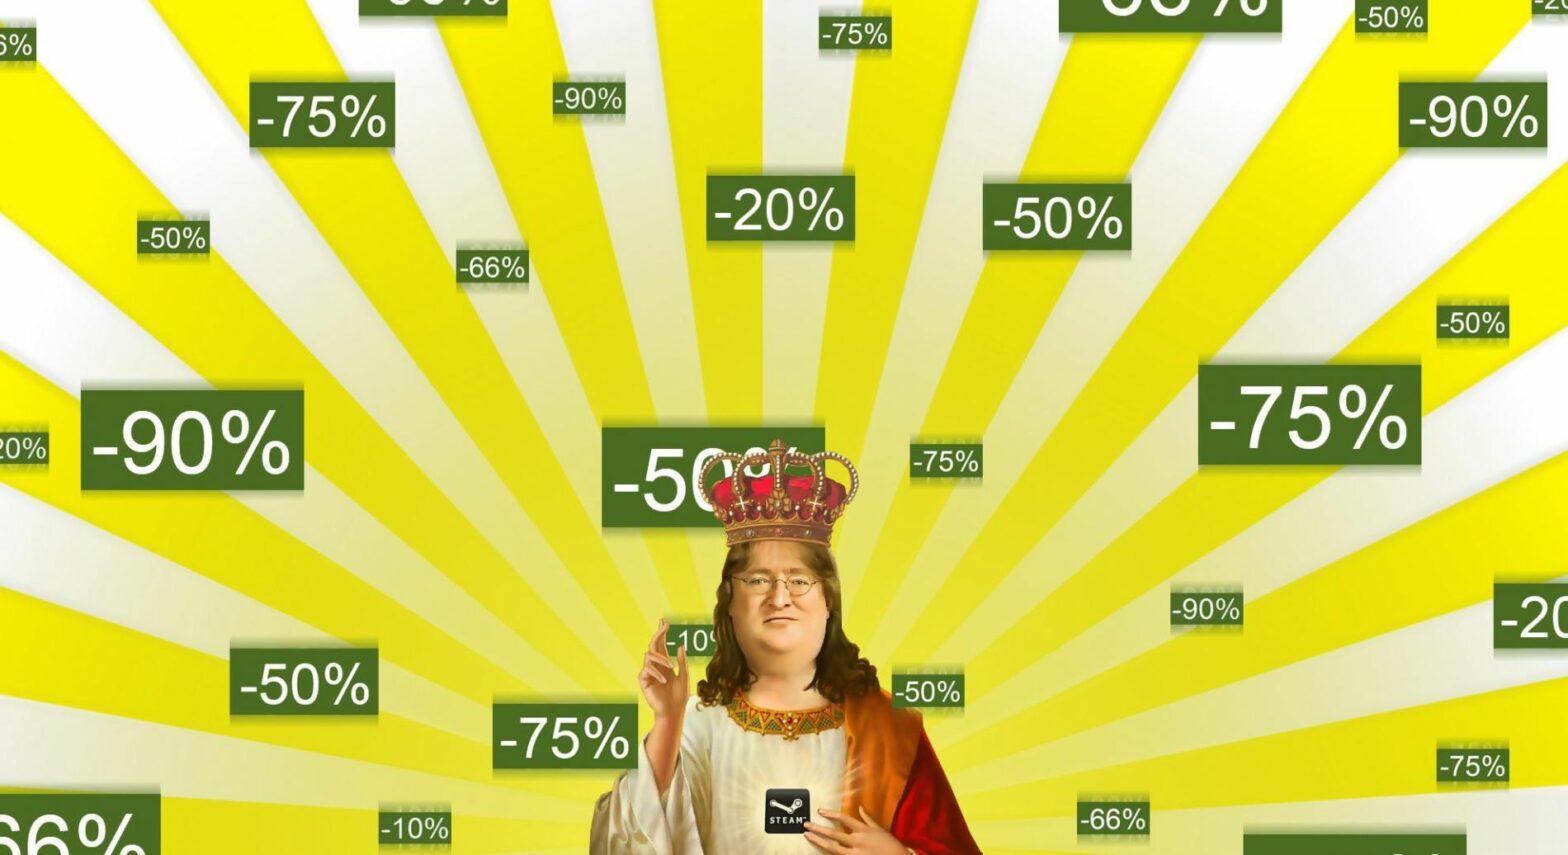 Steam Summer Sale 2015 beginnt am 11. Juni